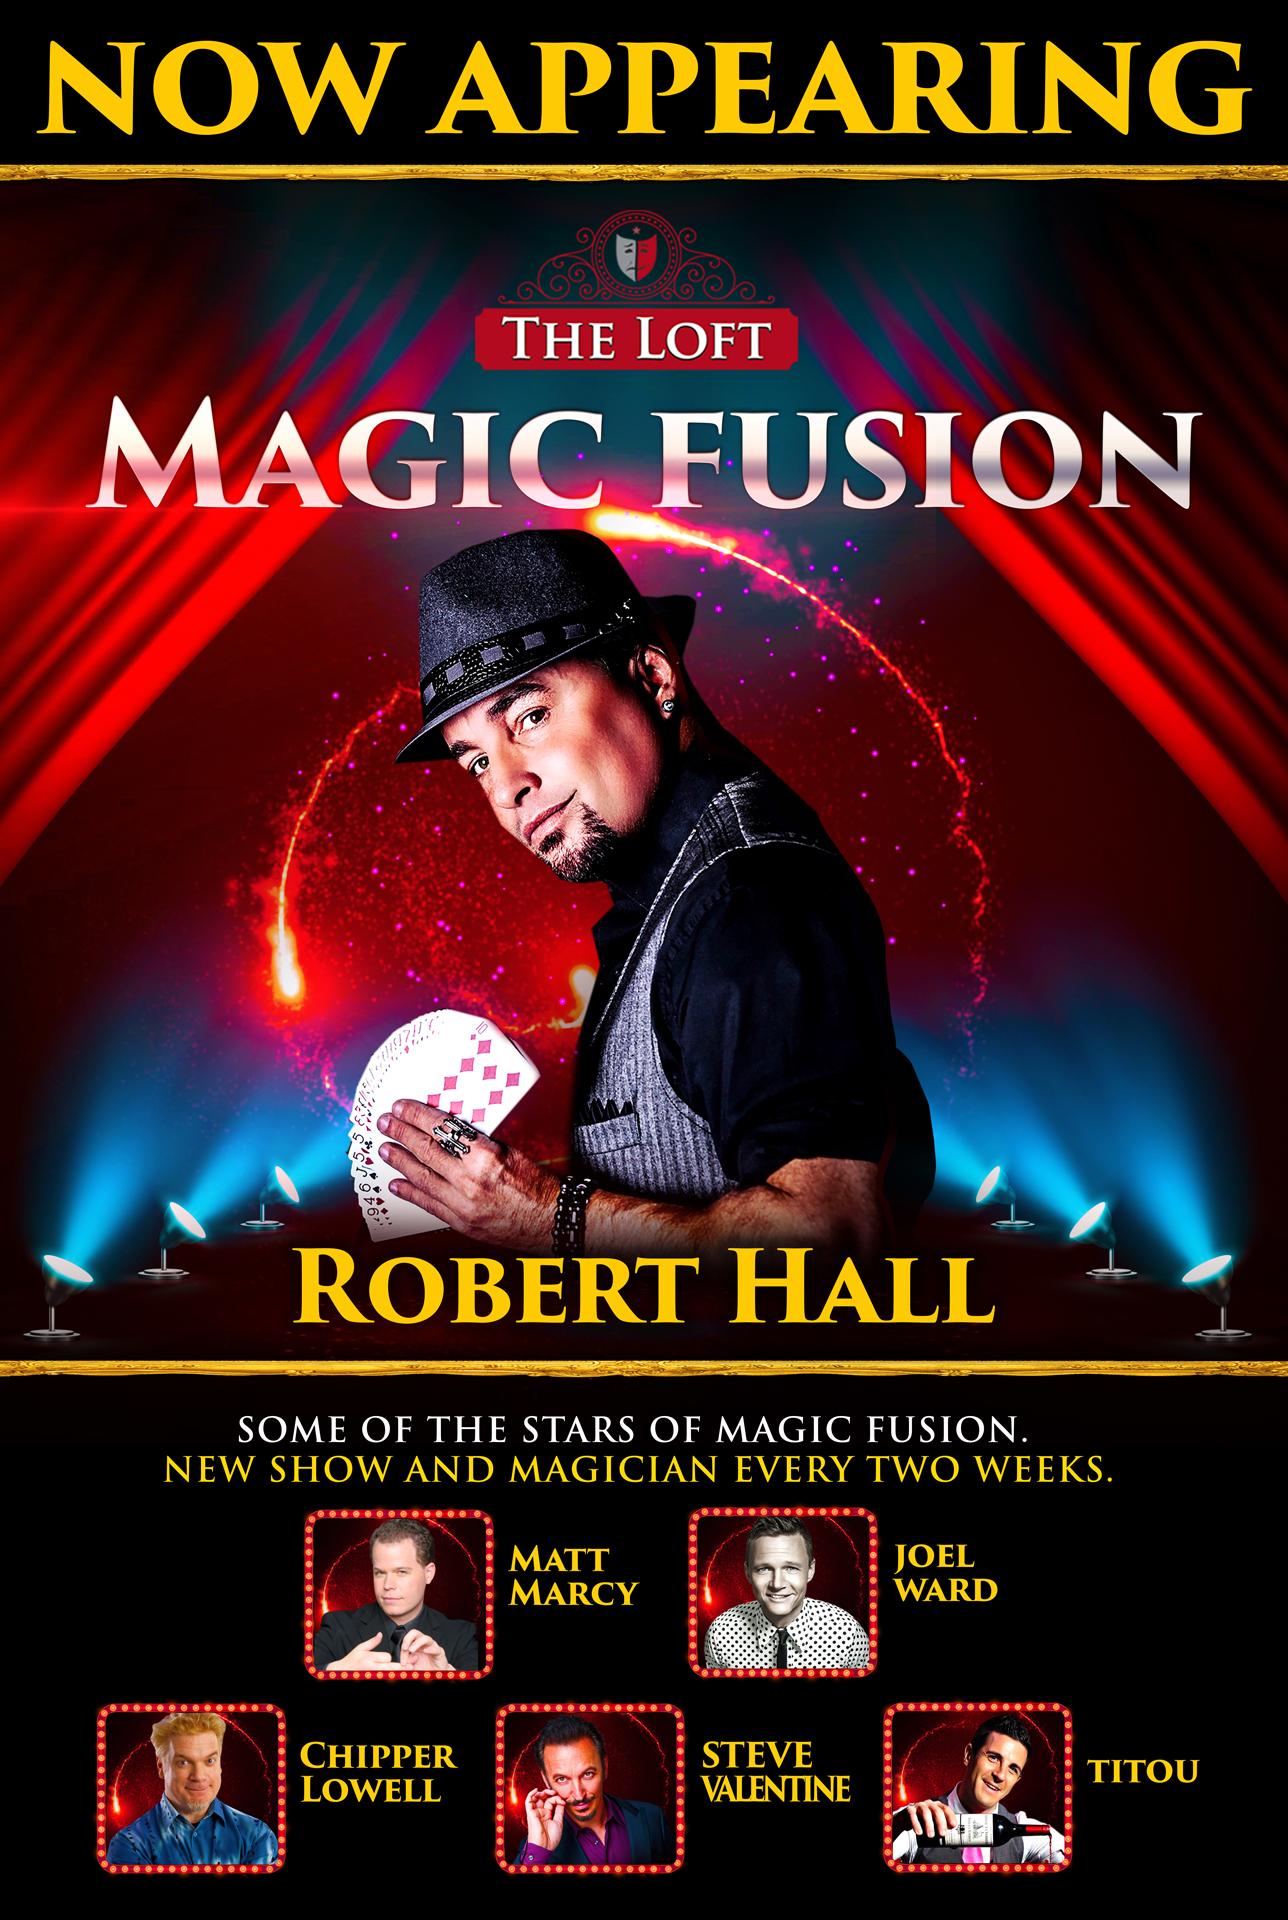 LOFT_MAGIC_NOW-APPEARING_ROBERT-HALL